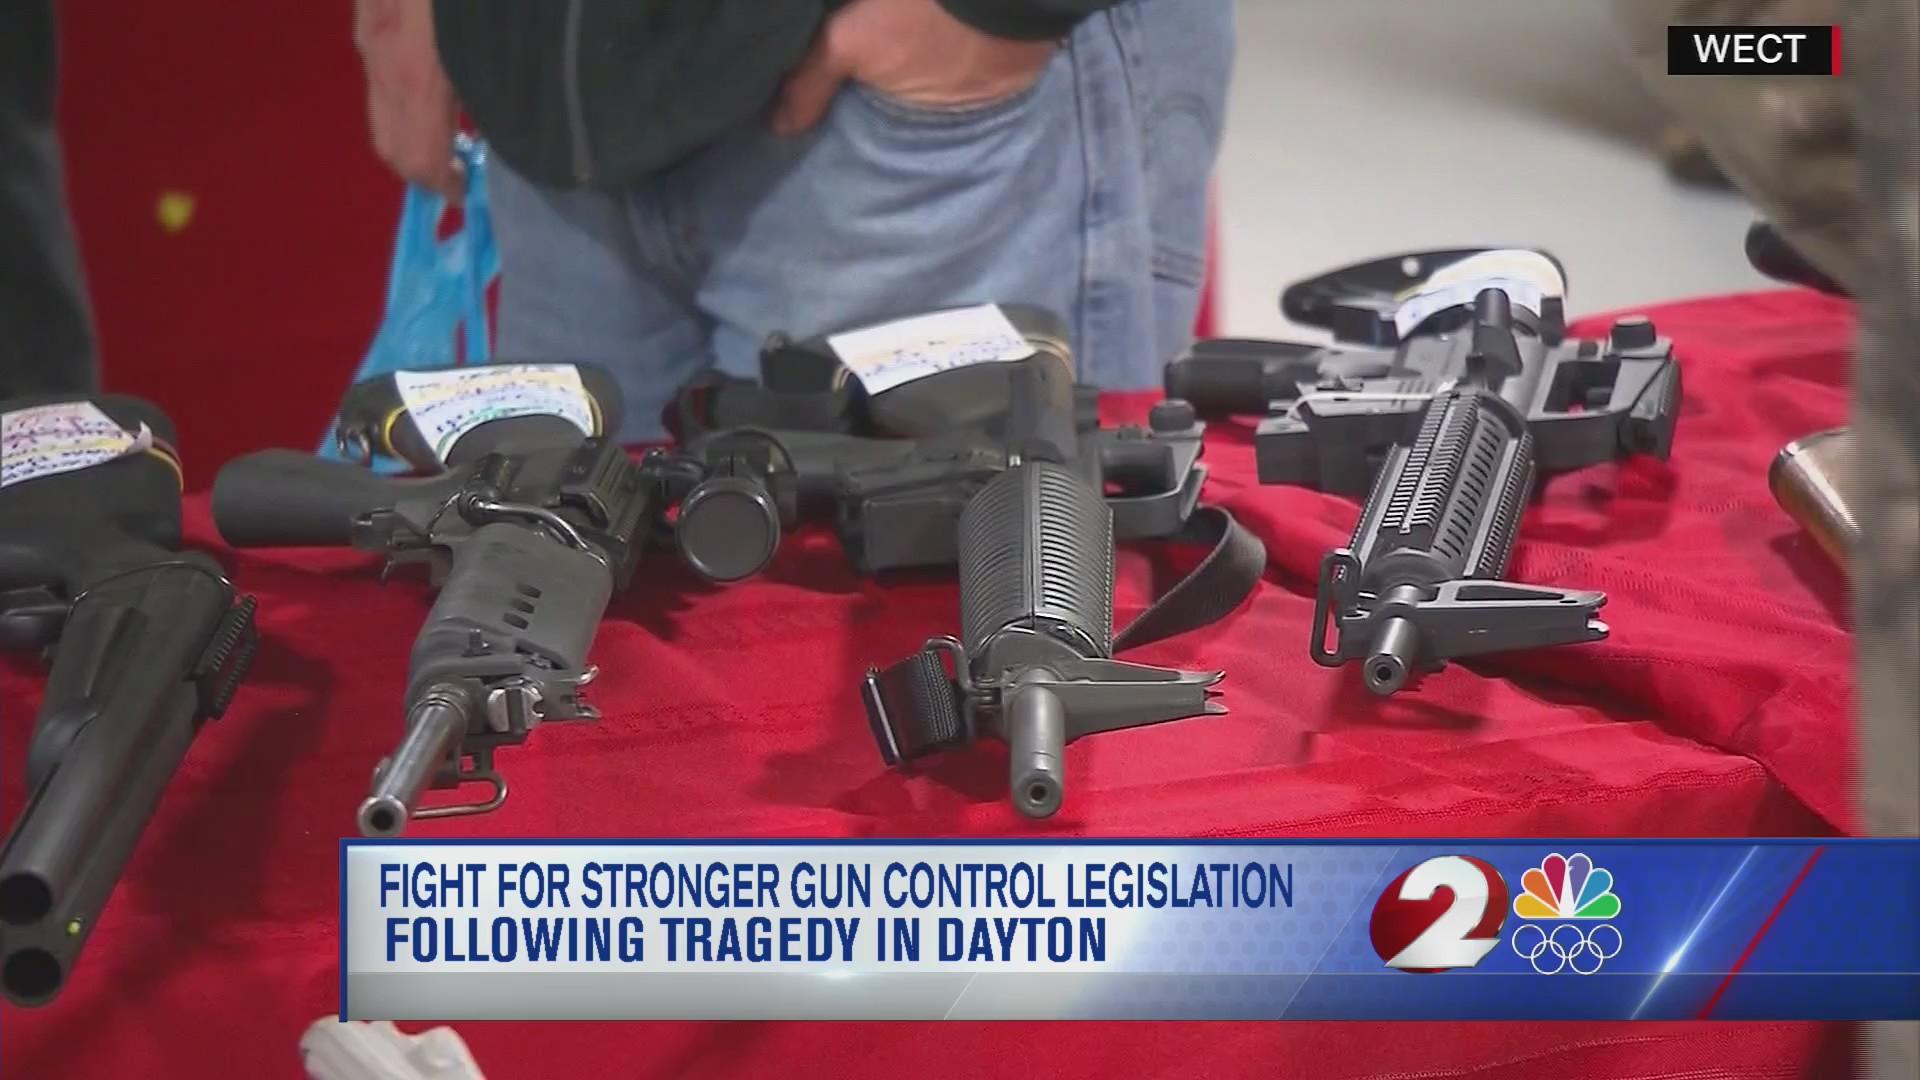 Fight for stronger gun control legislation following tragedy in Dayton